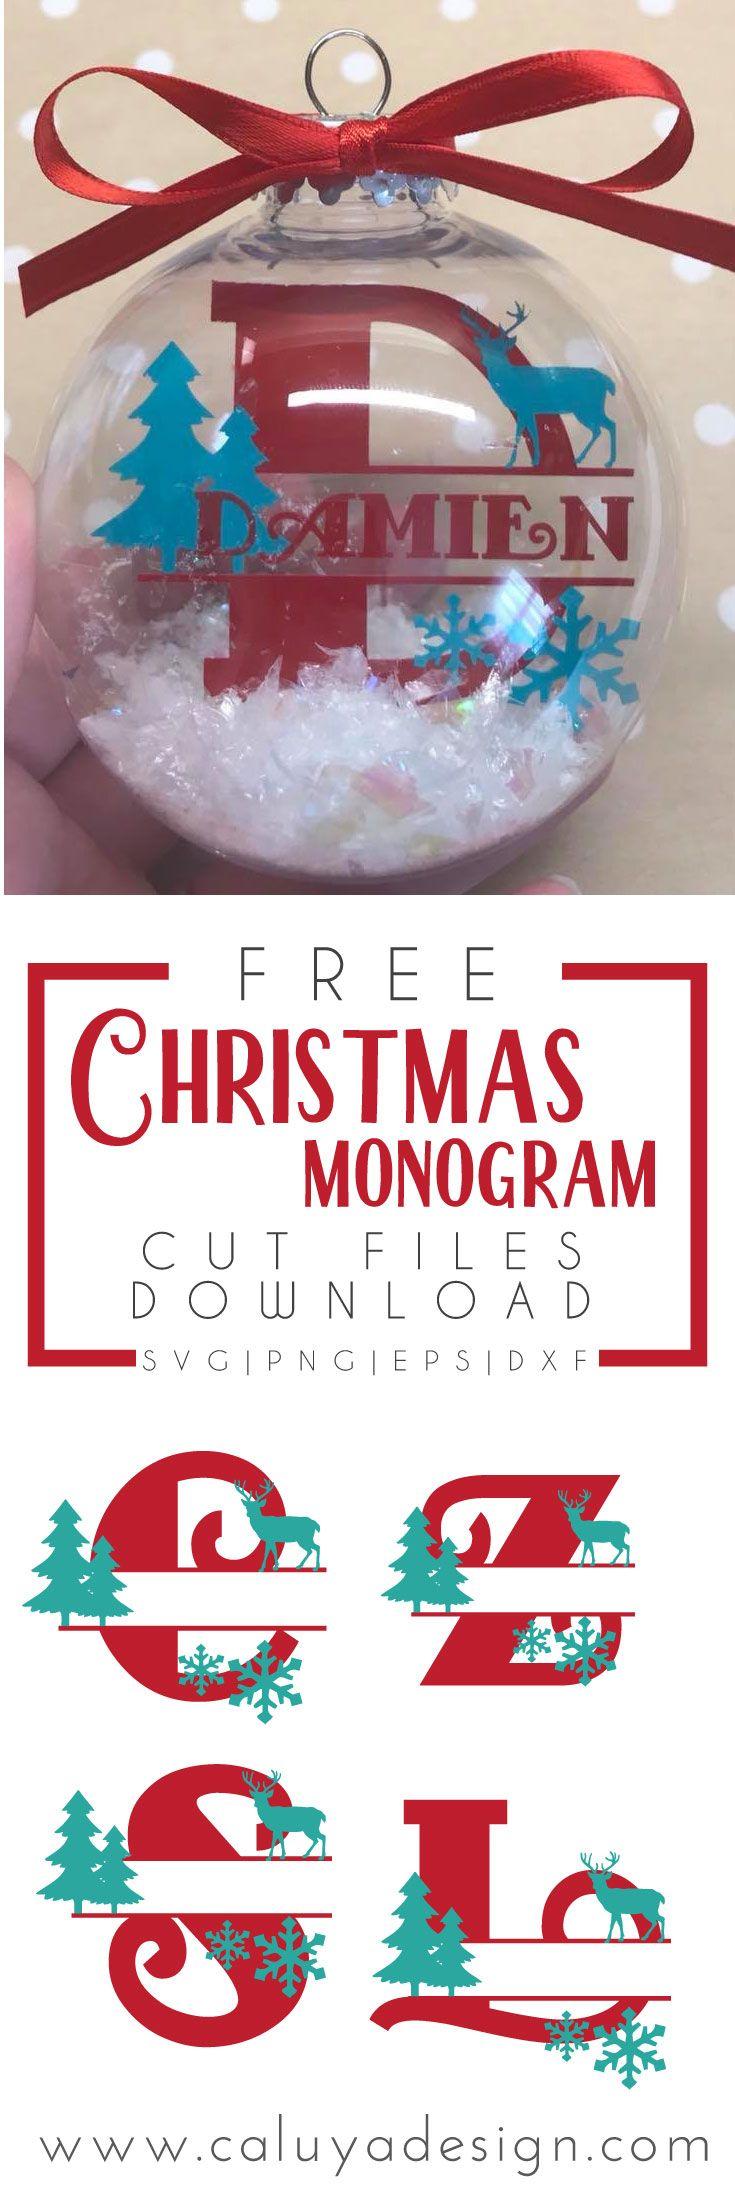 Christmas Split Monogram Free SVG, PNG, DXF, EPS Download